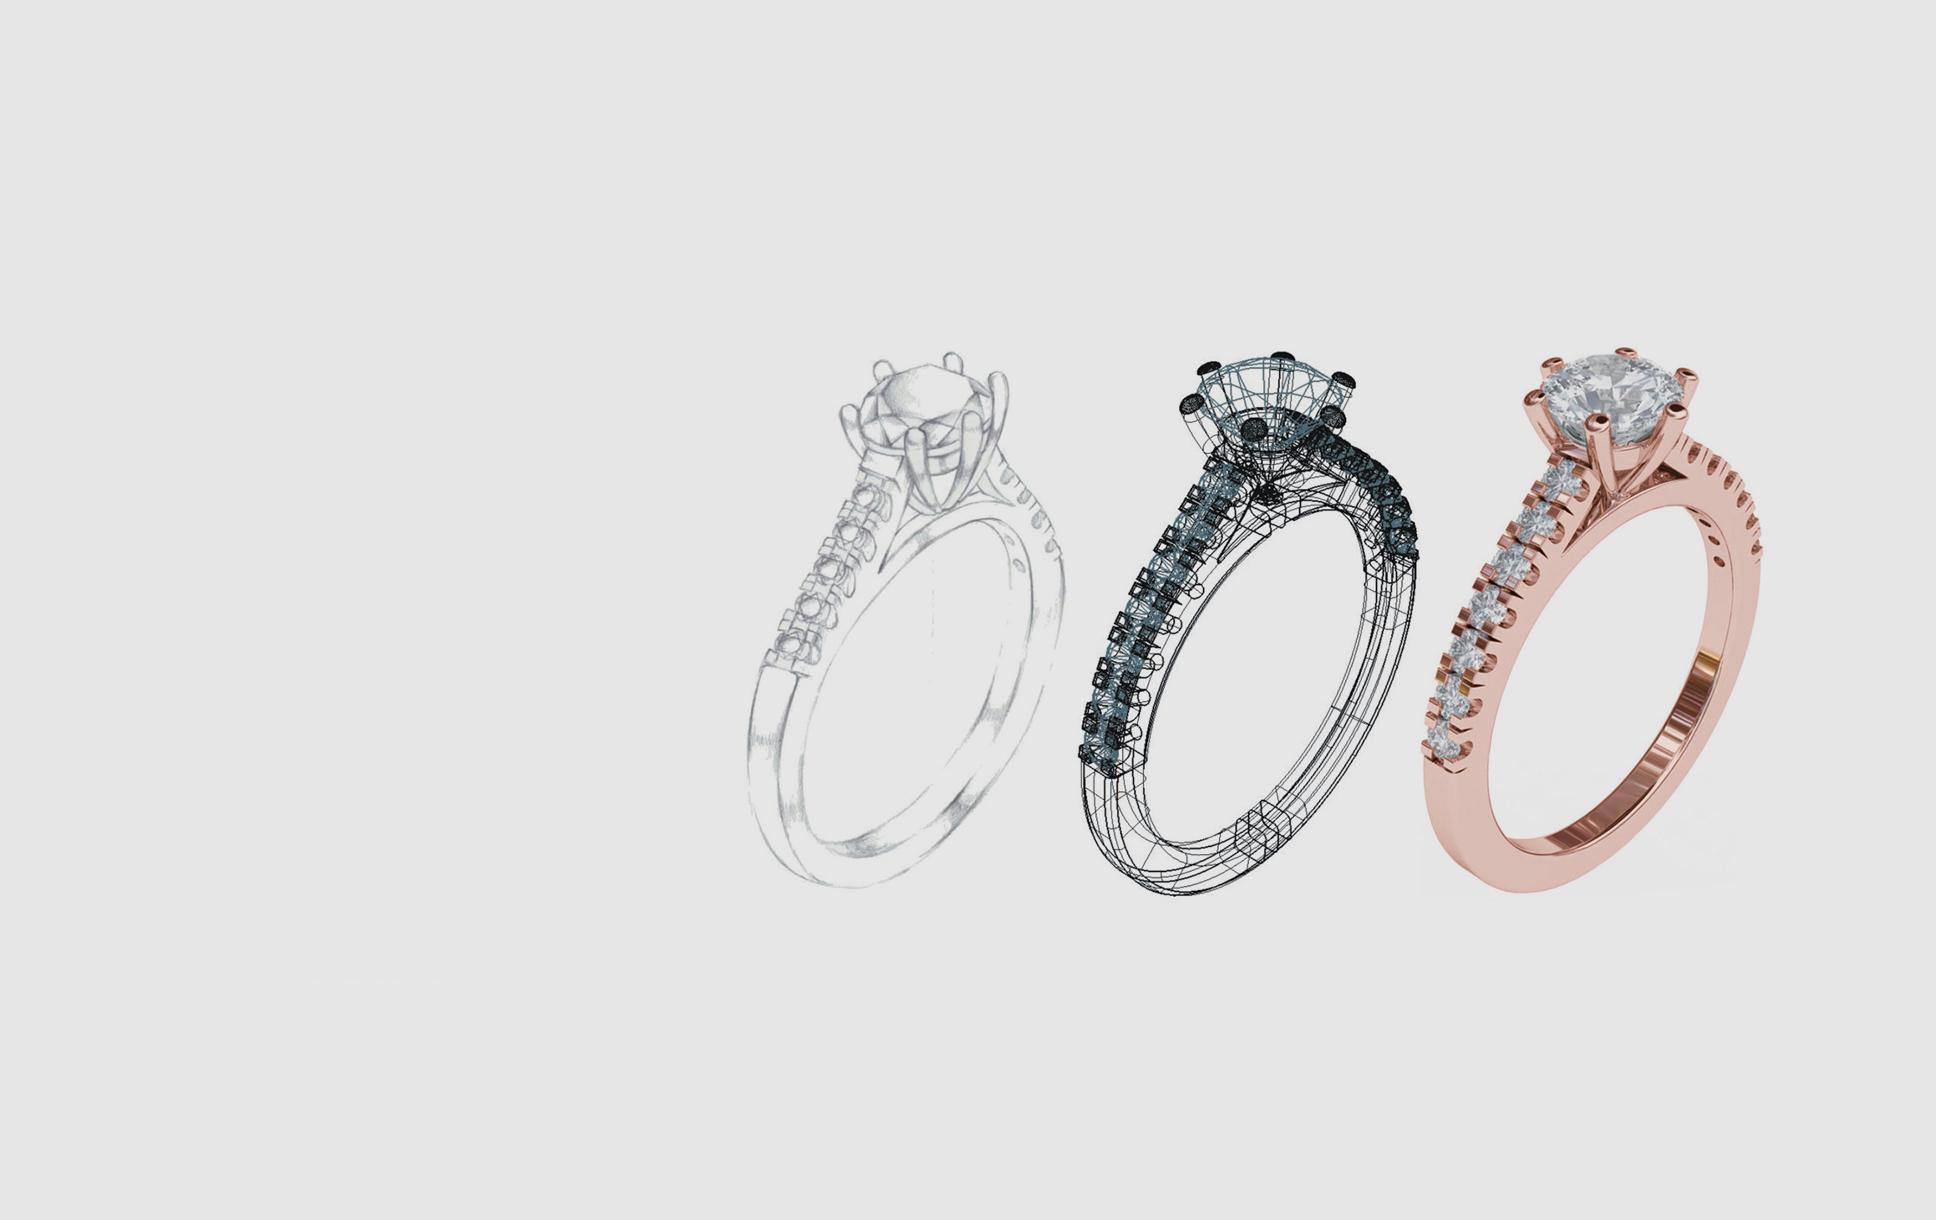 3d-printing-jewellery-design